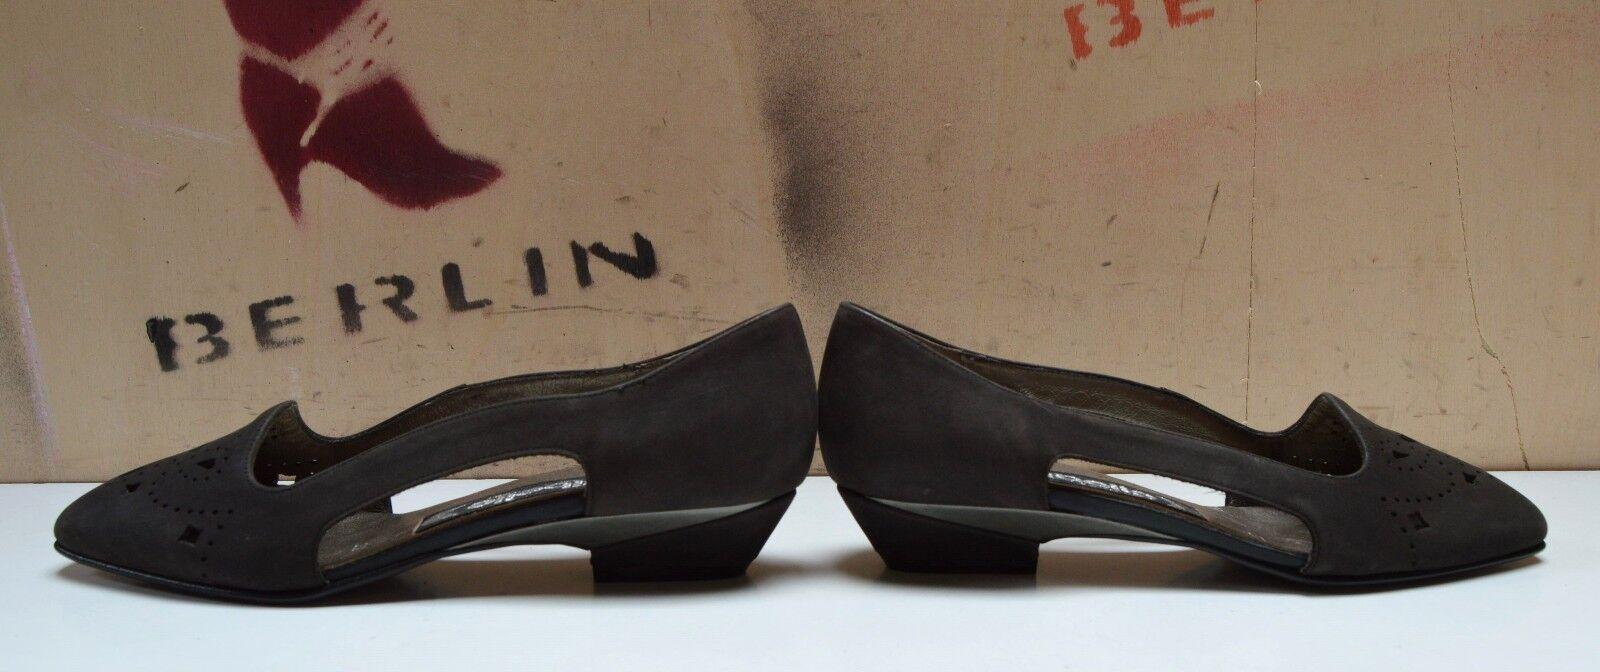 LIBELLE Damen Pumps UK 2,5 Ballerina made in W.Germany grau True Vintage flach grau W.Germany cd128c